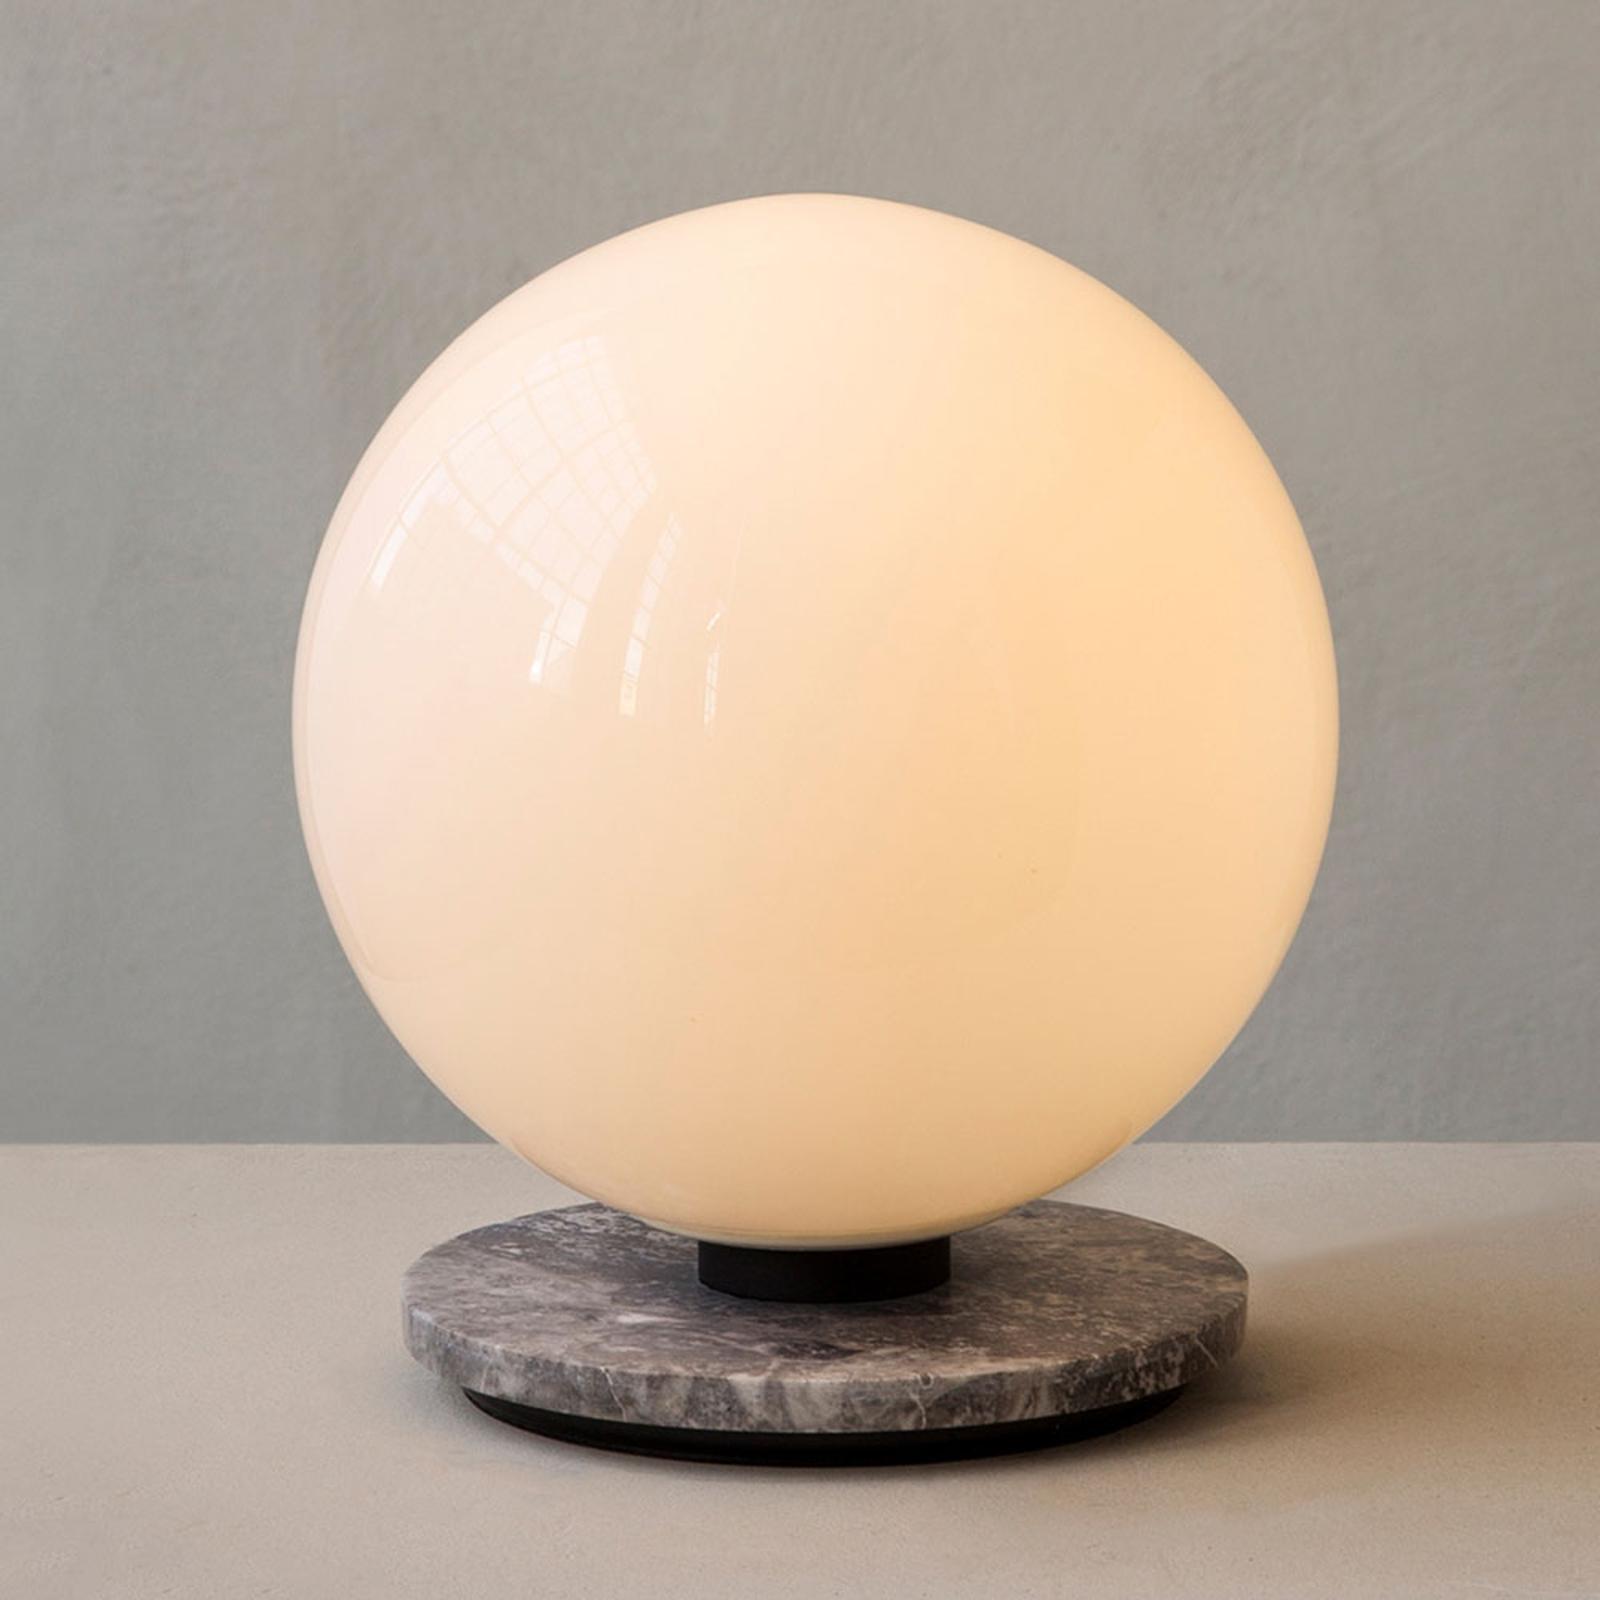 Menu TR Bulb DTW Tischlampe 22cm Marmor/opal glanz